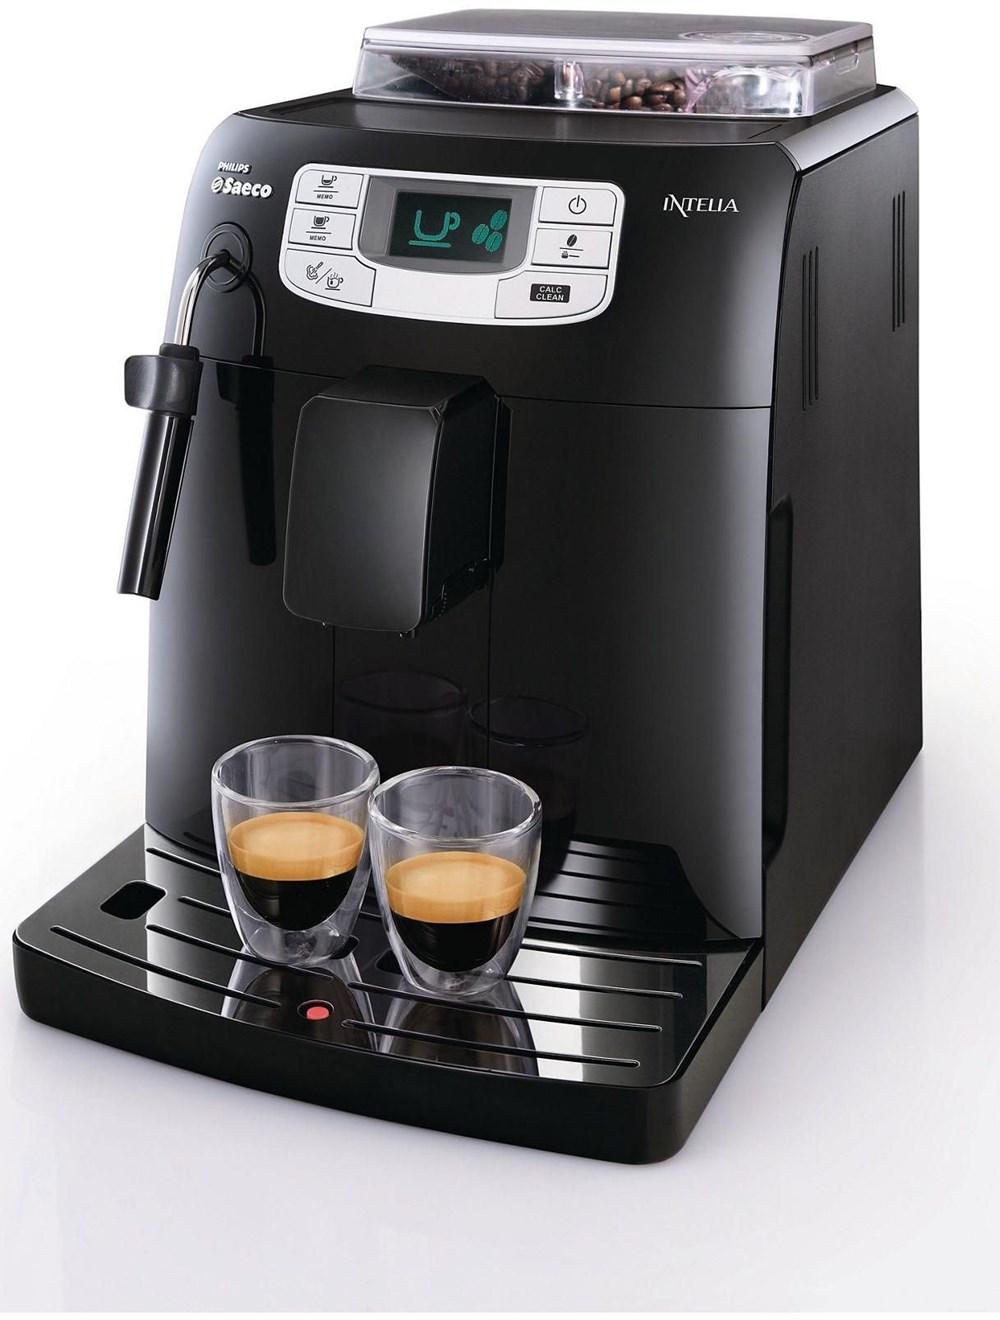 Philips Coffee Maker Bean To Cup : Philips Saeco Intelia Fokus HD8751 Kaffeevollautomat schwarz - Bean-to-Cup Coffee Machines ...